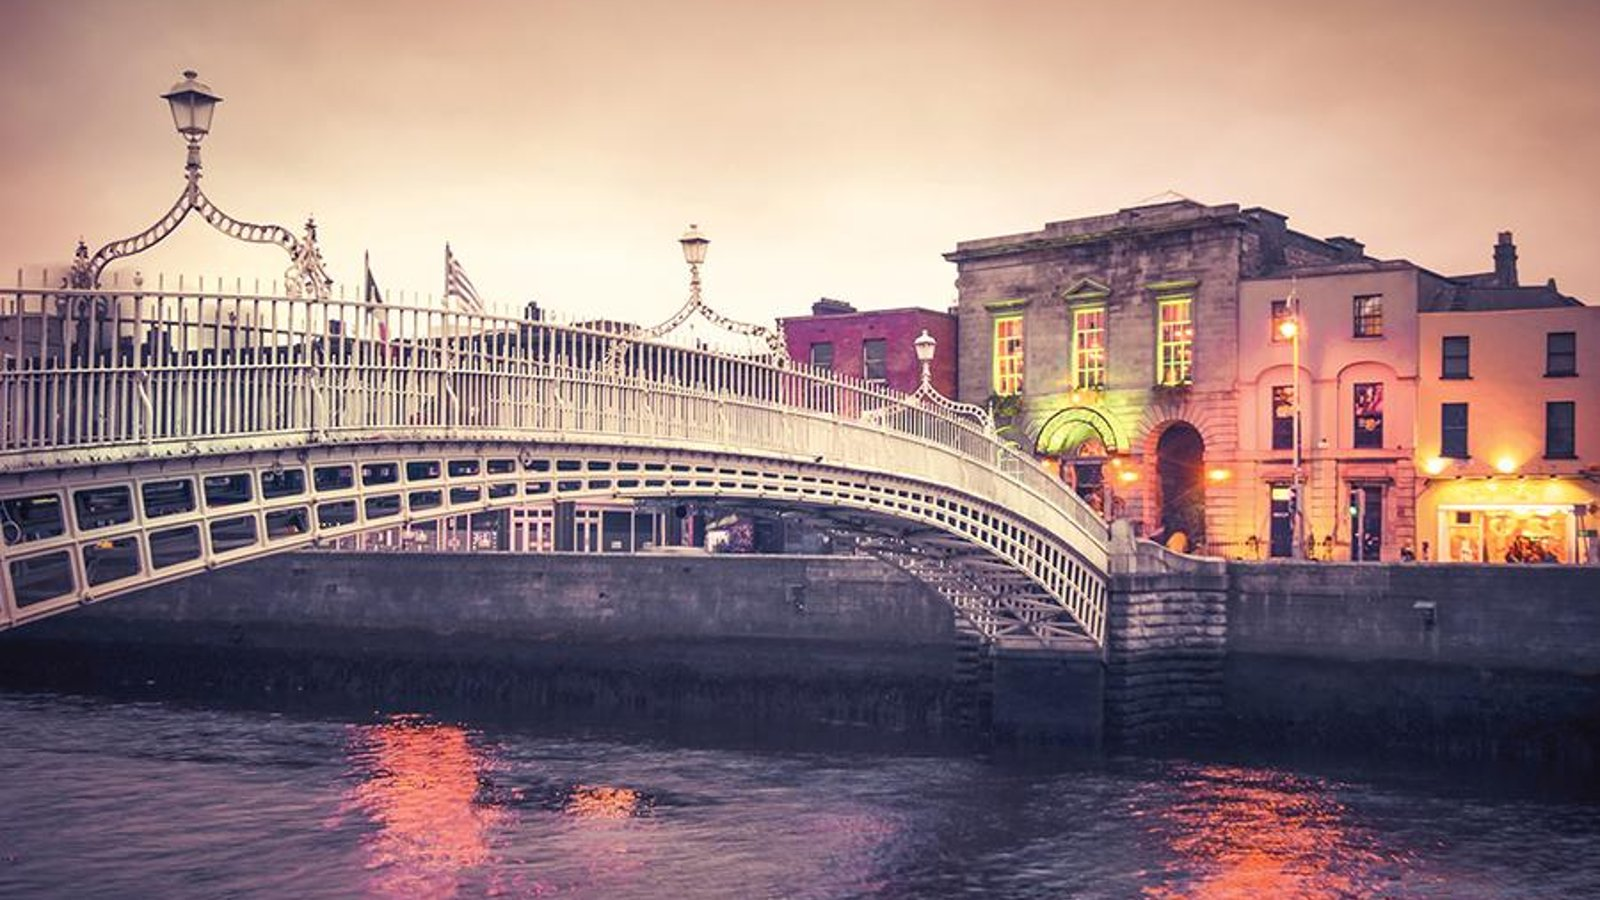 Joyce's Dubliners - Anatomy of a City